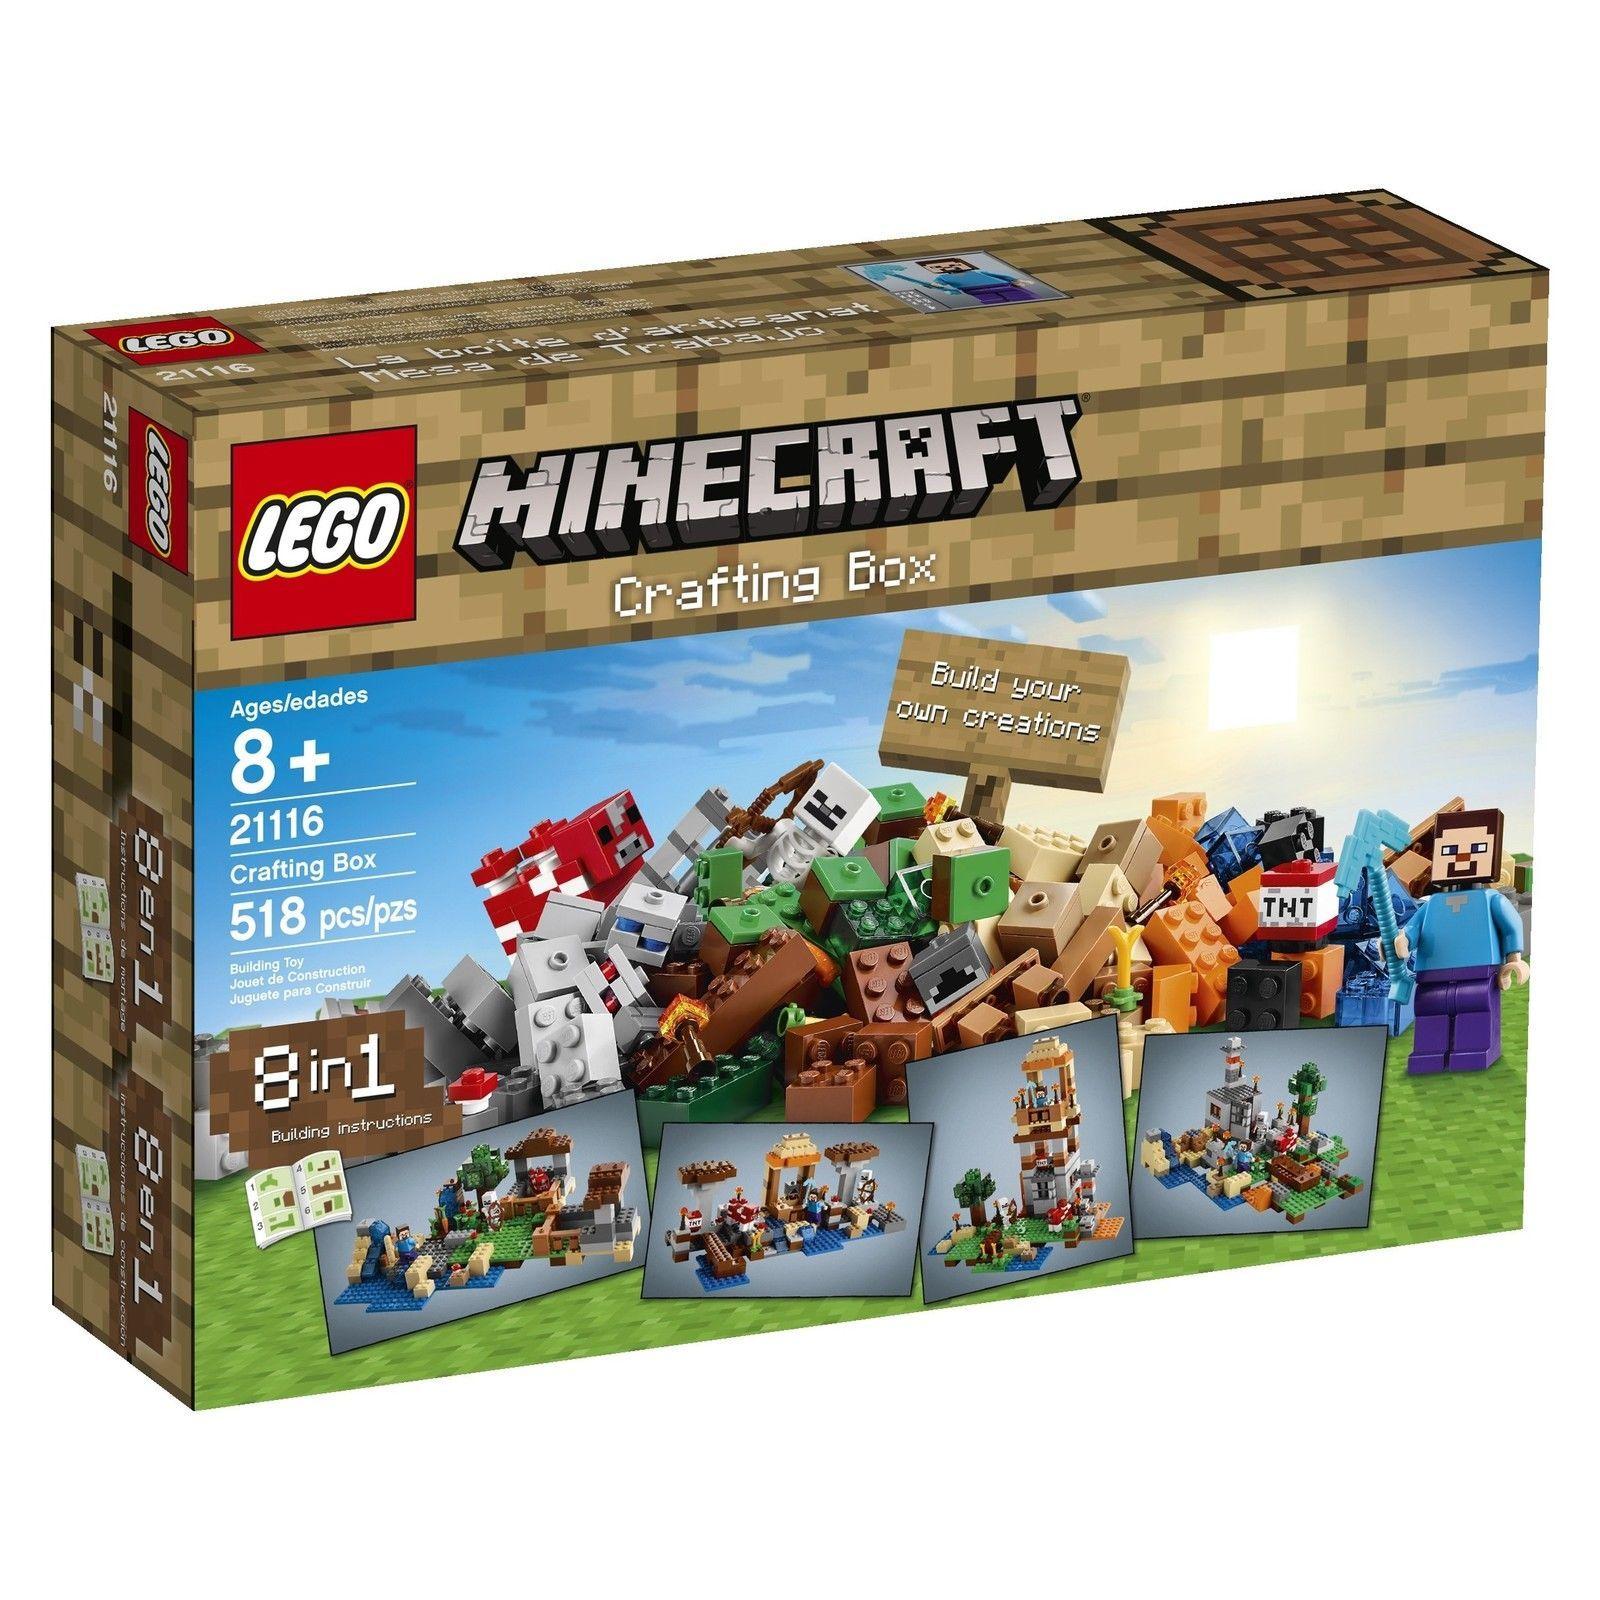 LEGO Minecraft 21116 Crafting Box [New] Building Set